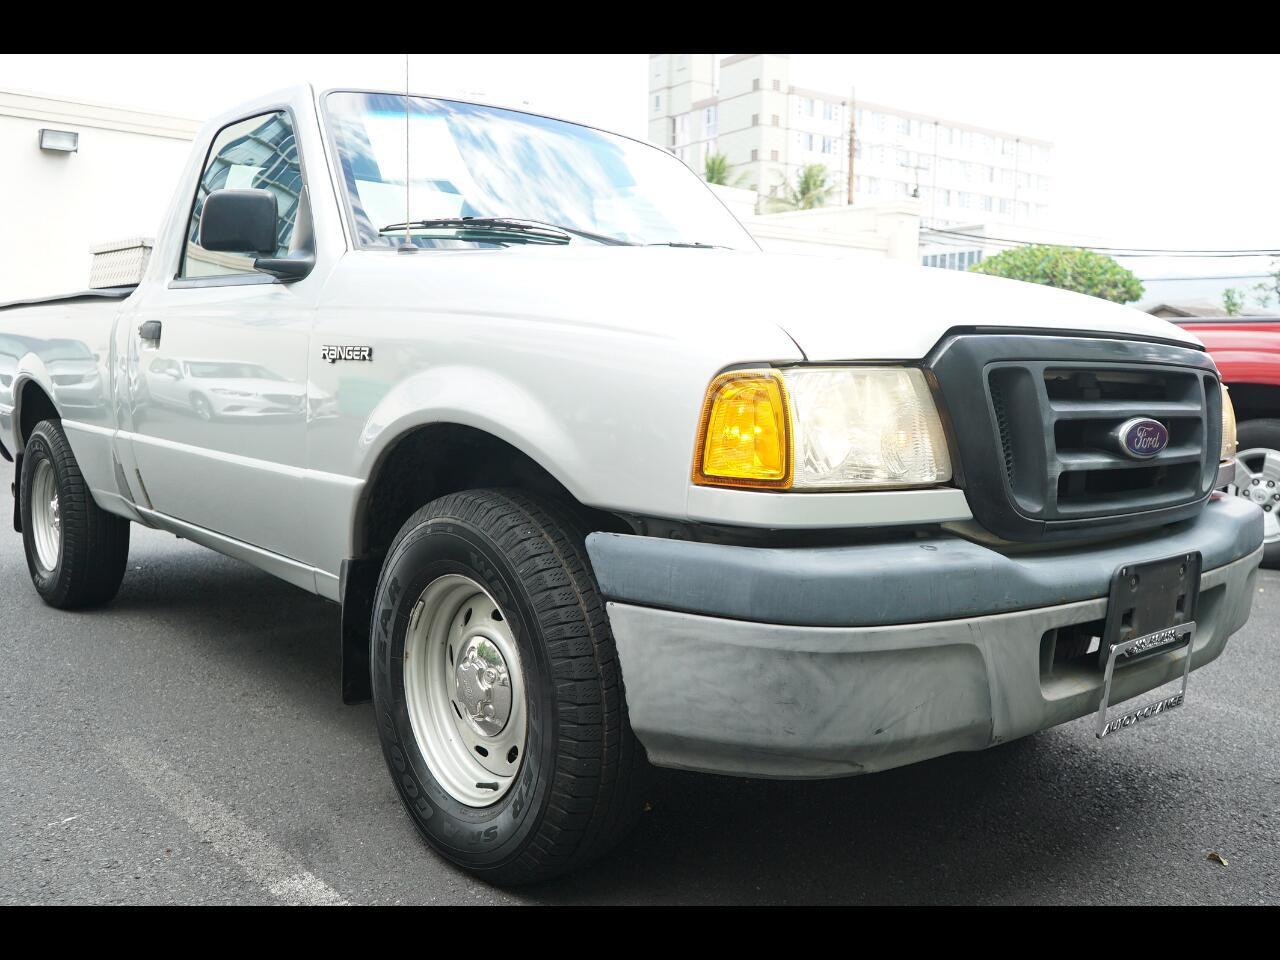 2004 Ford Ranger Reg Cab 3.0L Edge